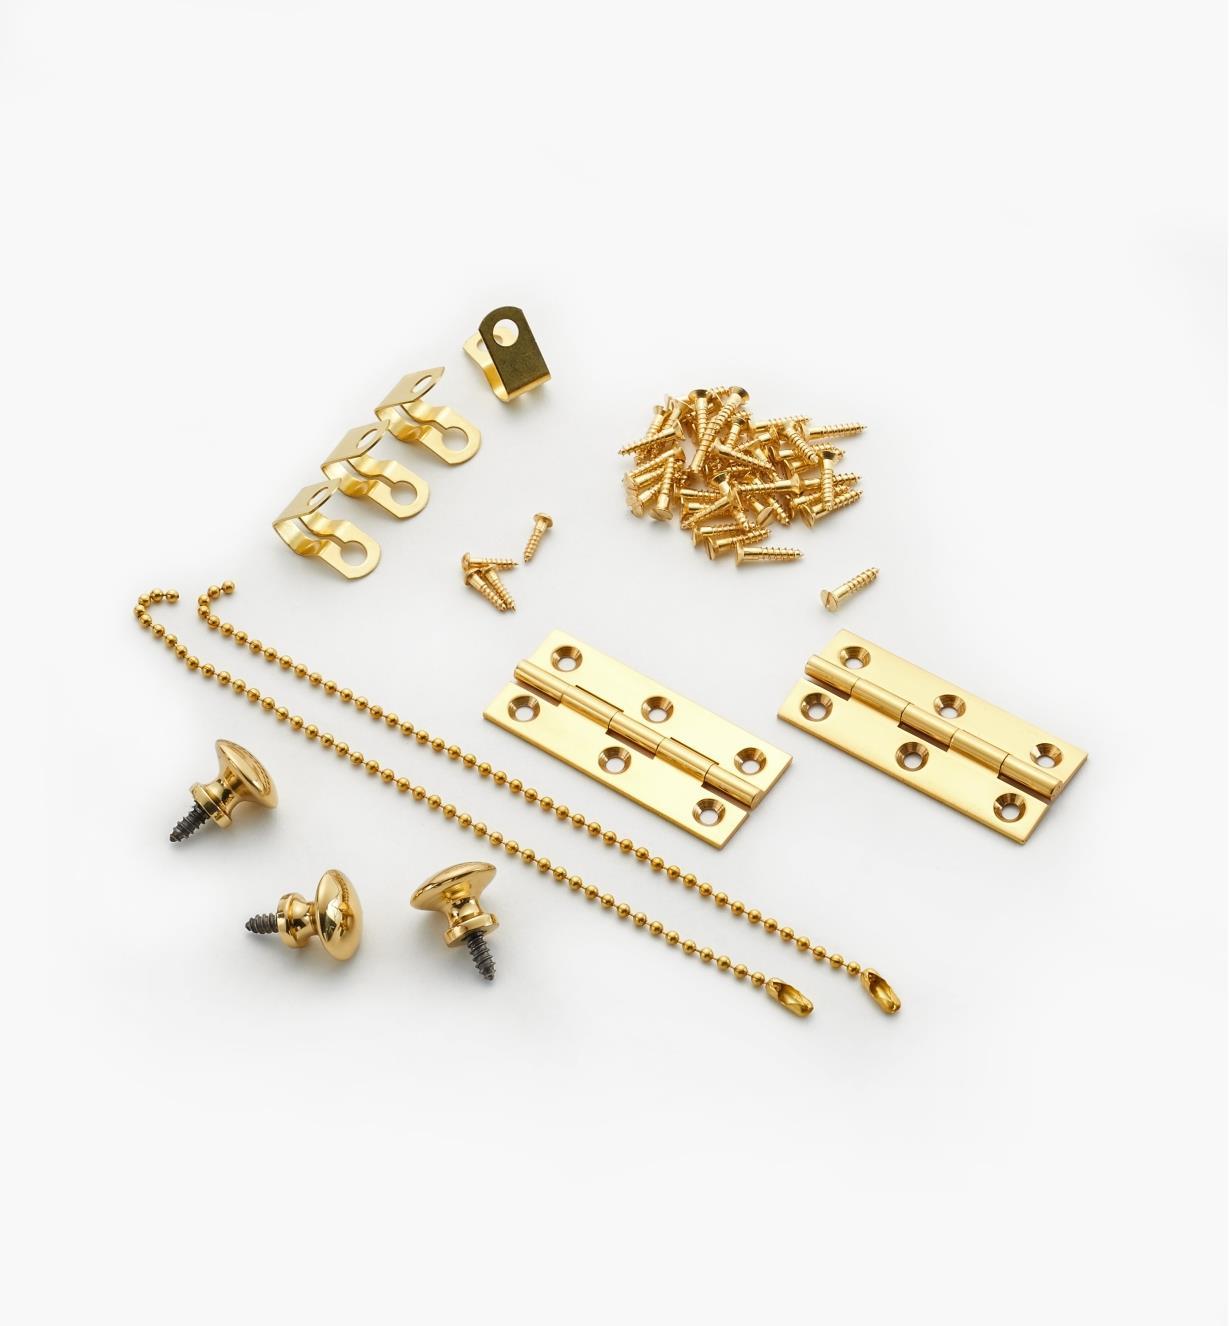 05K1401 - Hardware Package